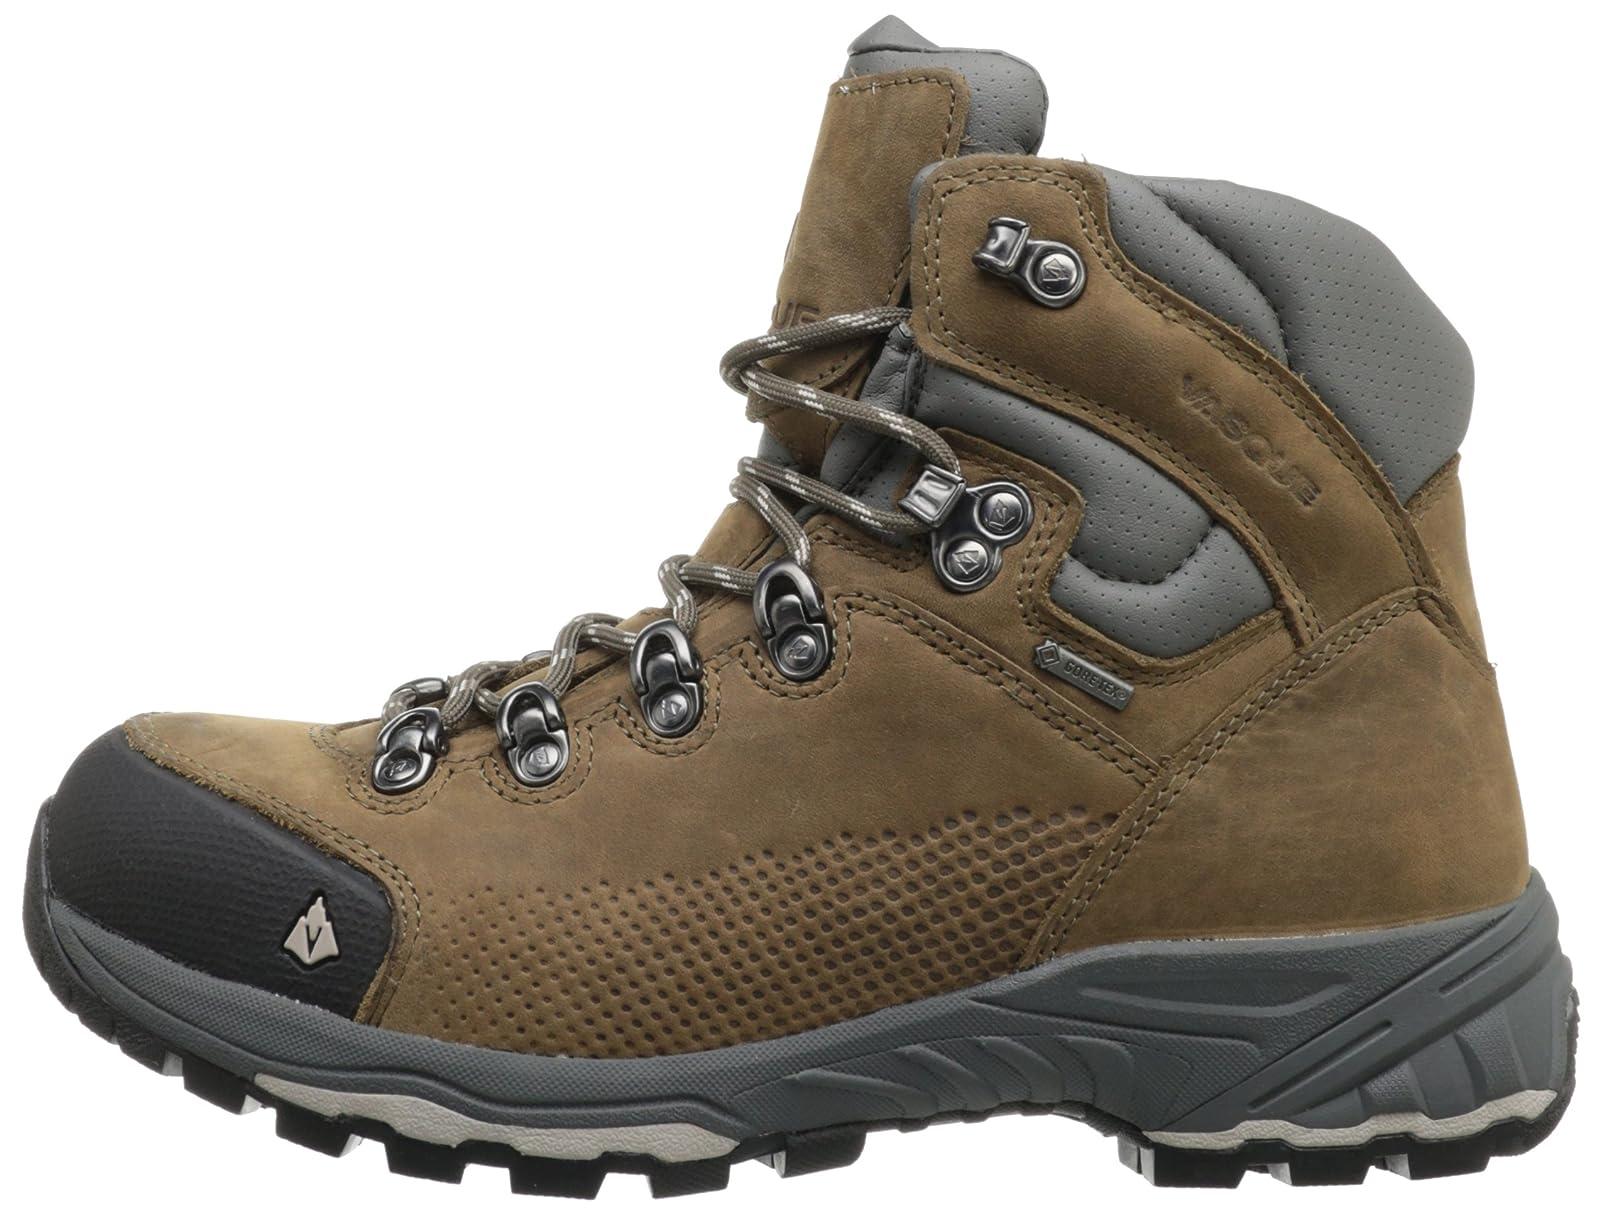 Vasque Women's St. Elias Gore-Tex Hiking Boot 8 M US Women - 5